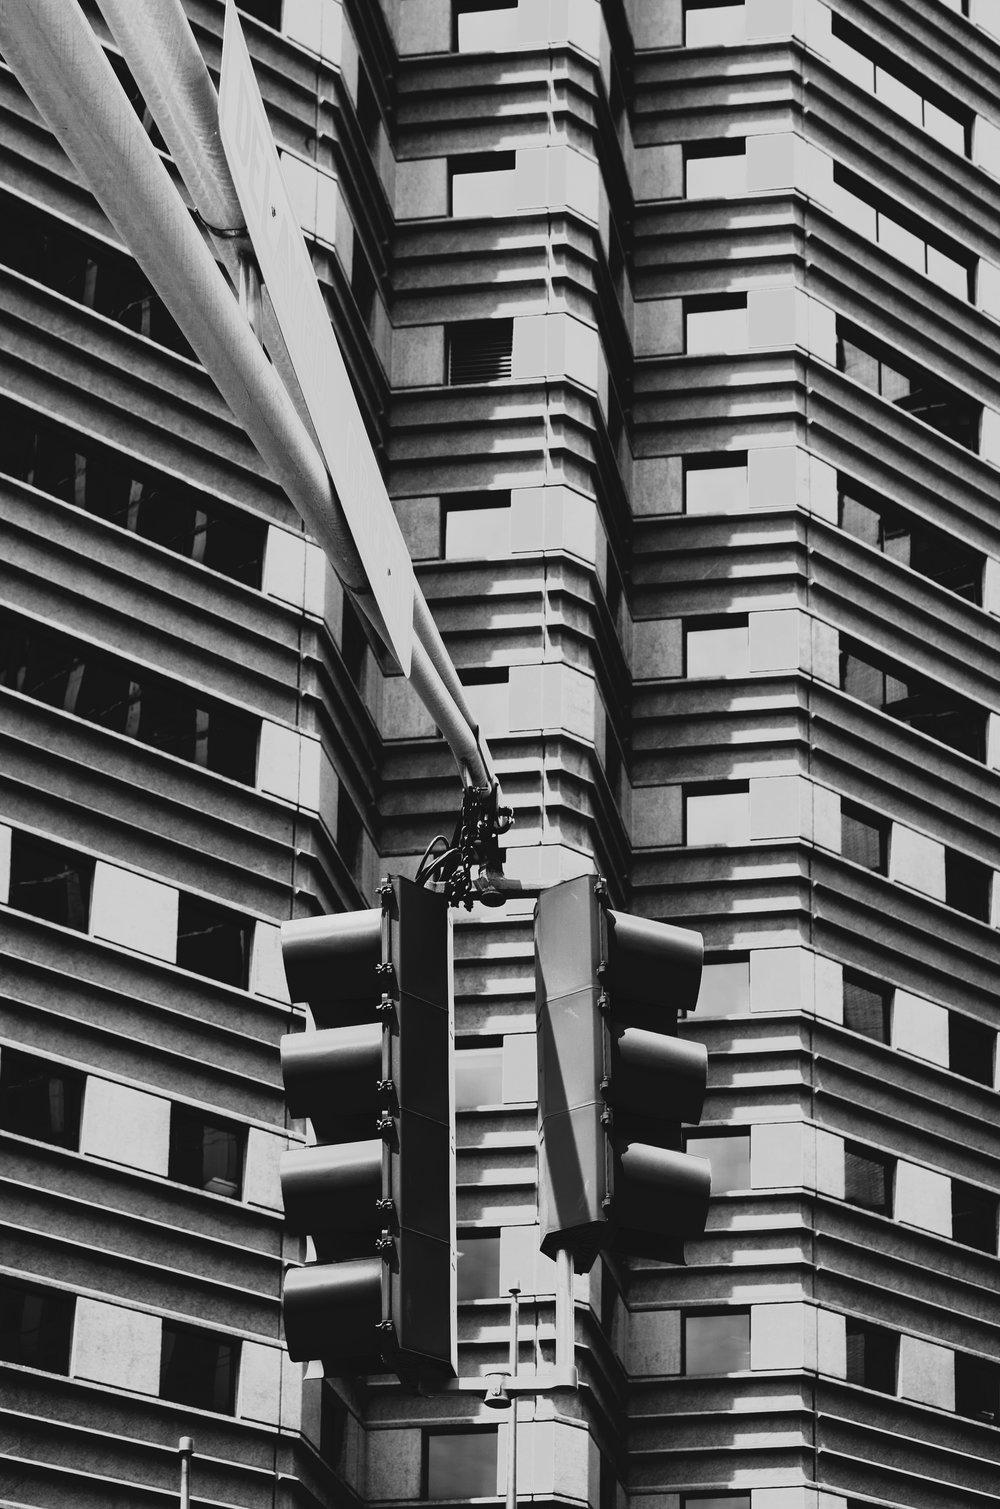 jerseycity-5.jpg